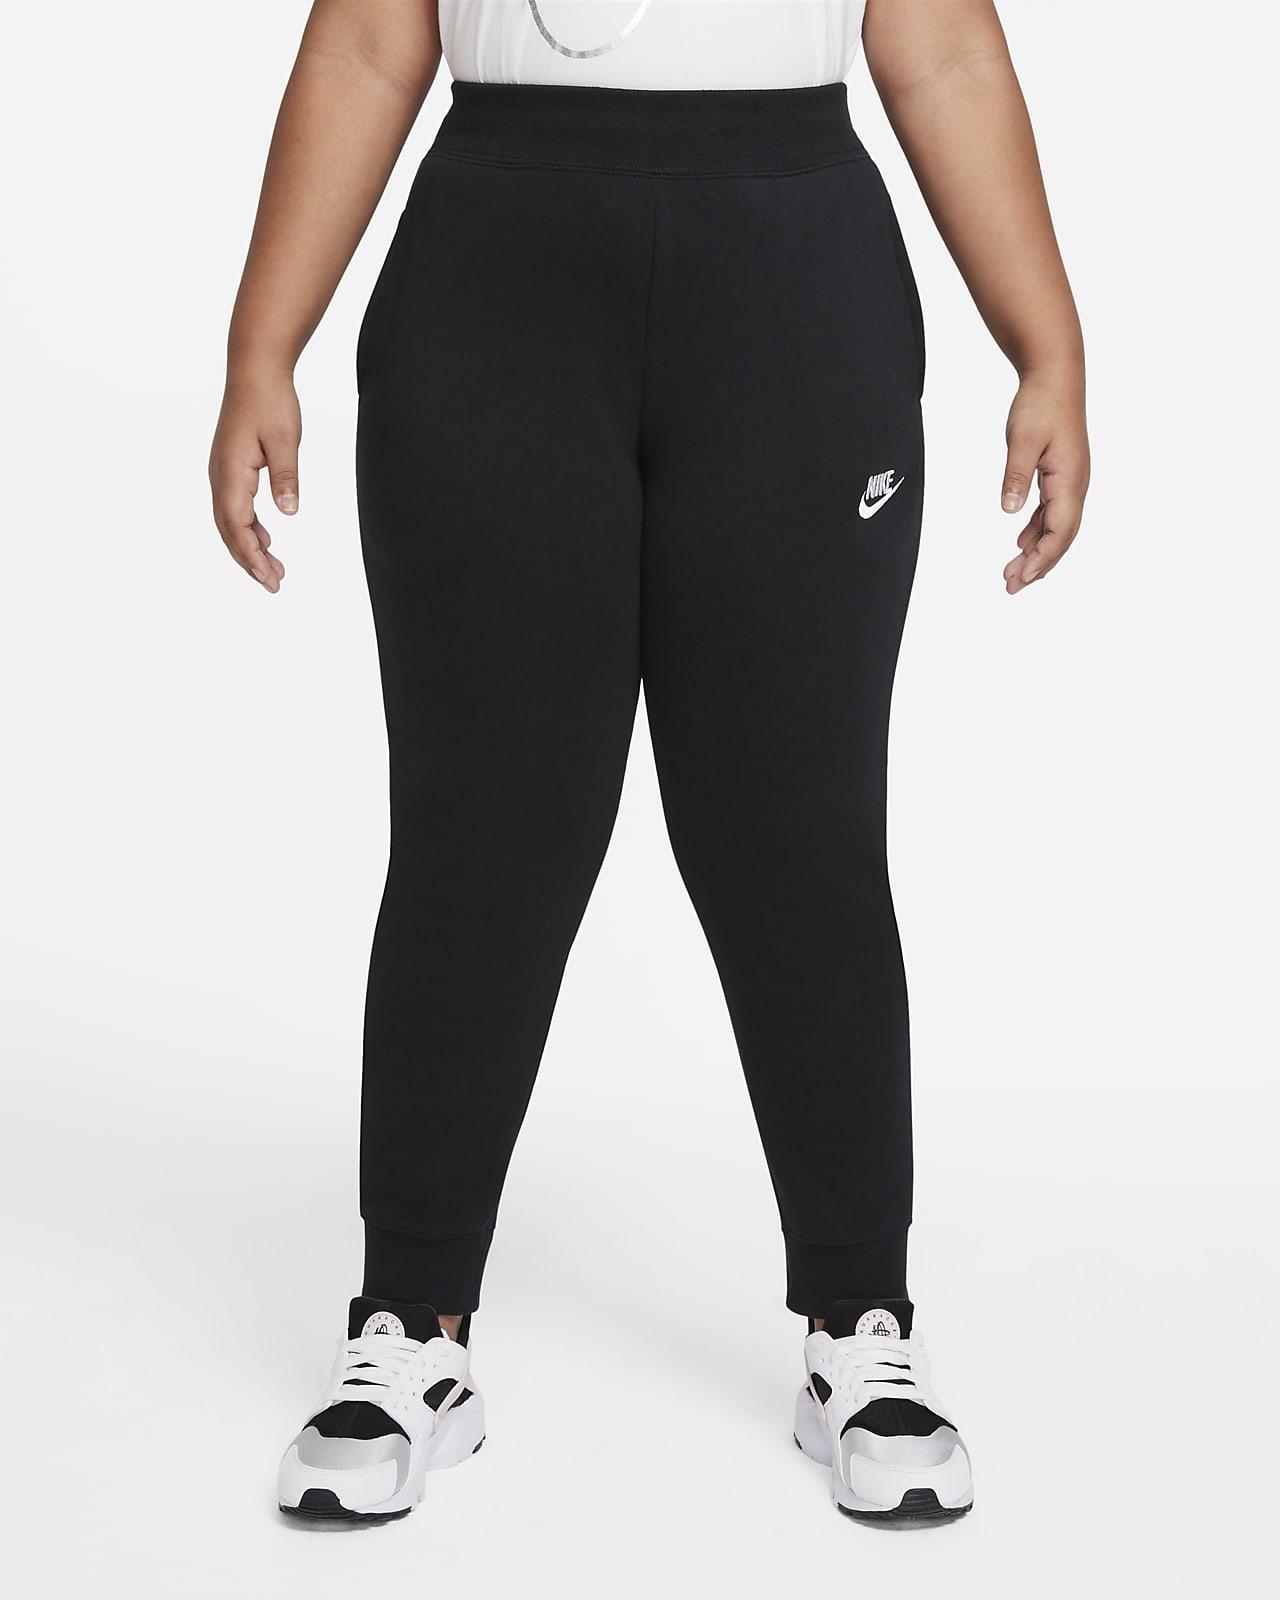 Pantaloni Nike Sportswear Club Fleece (Taglia grande) - Ragazza